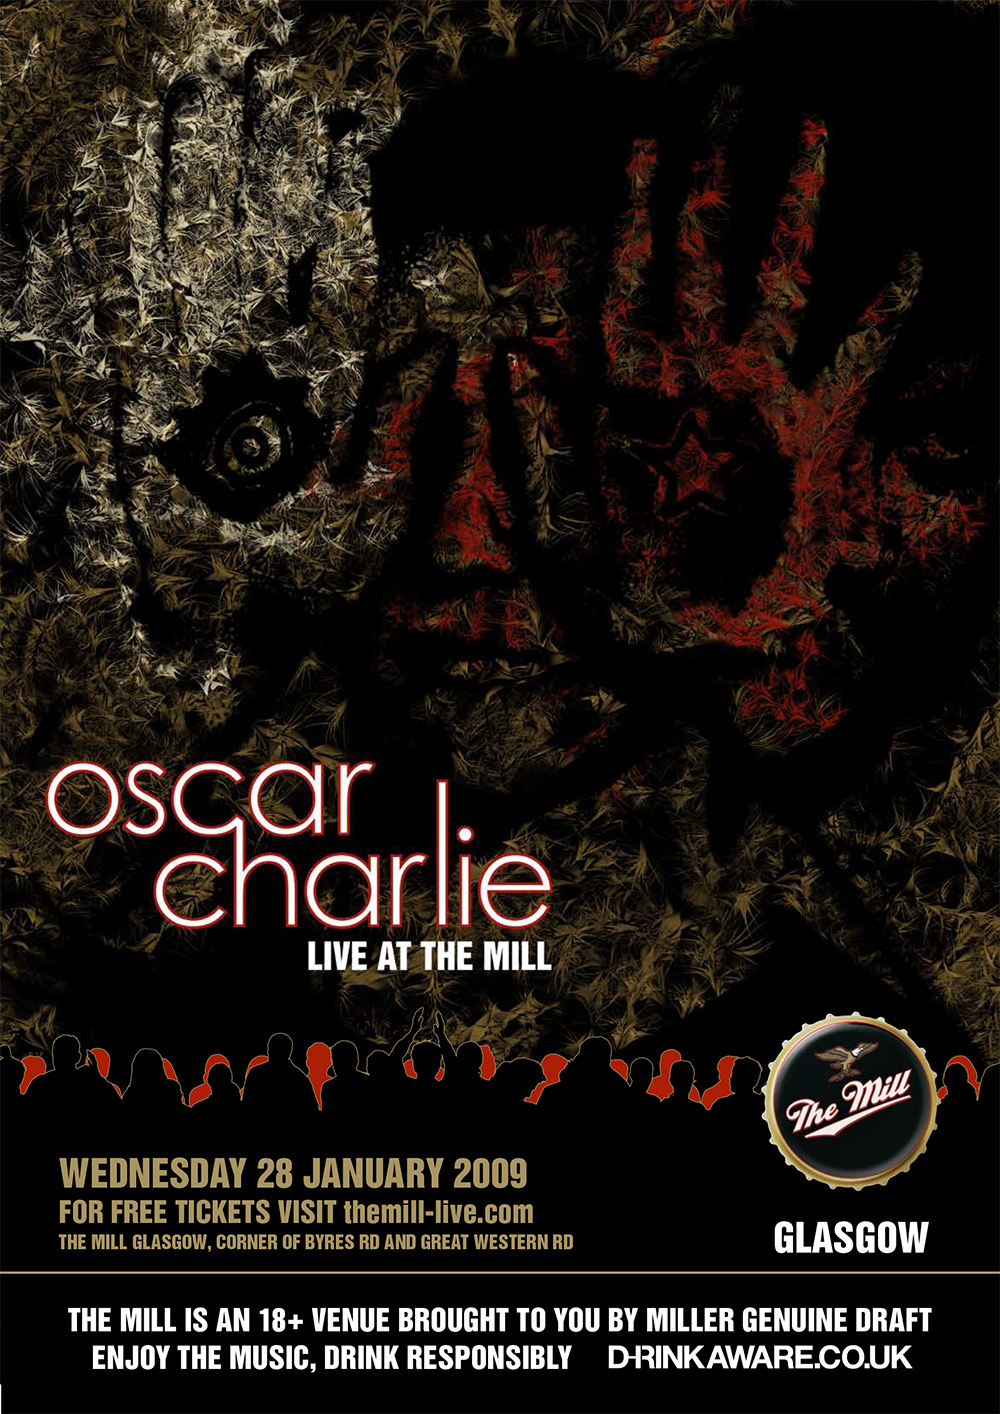 Oscar Charlie copy.jpg